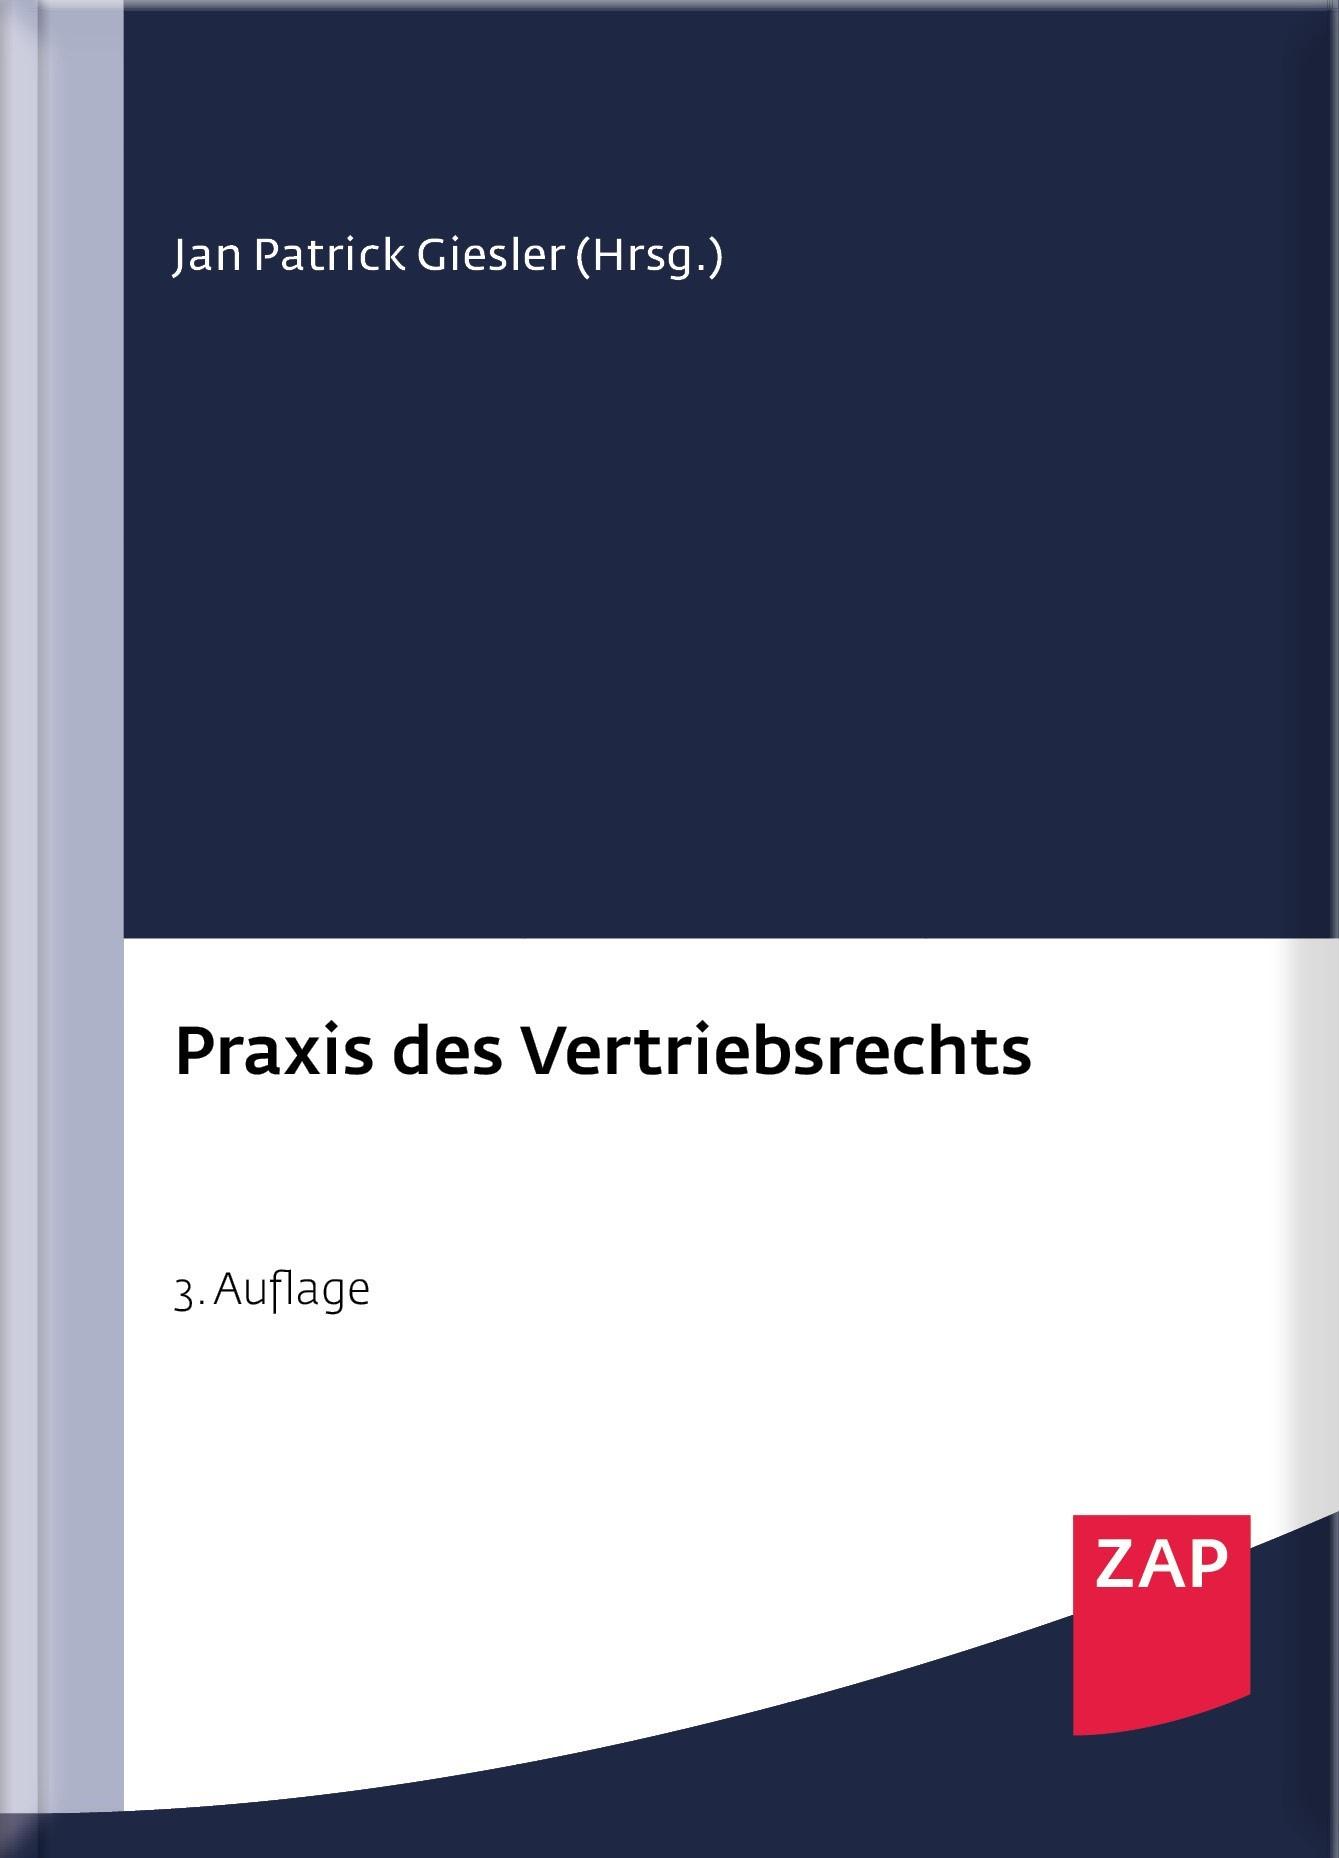 Praxis des Vertriebsrechts | Giesler (Hrsg.) | 3. Auflage, 2018 | Buch (Cover)